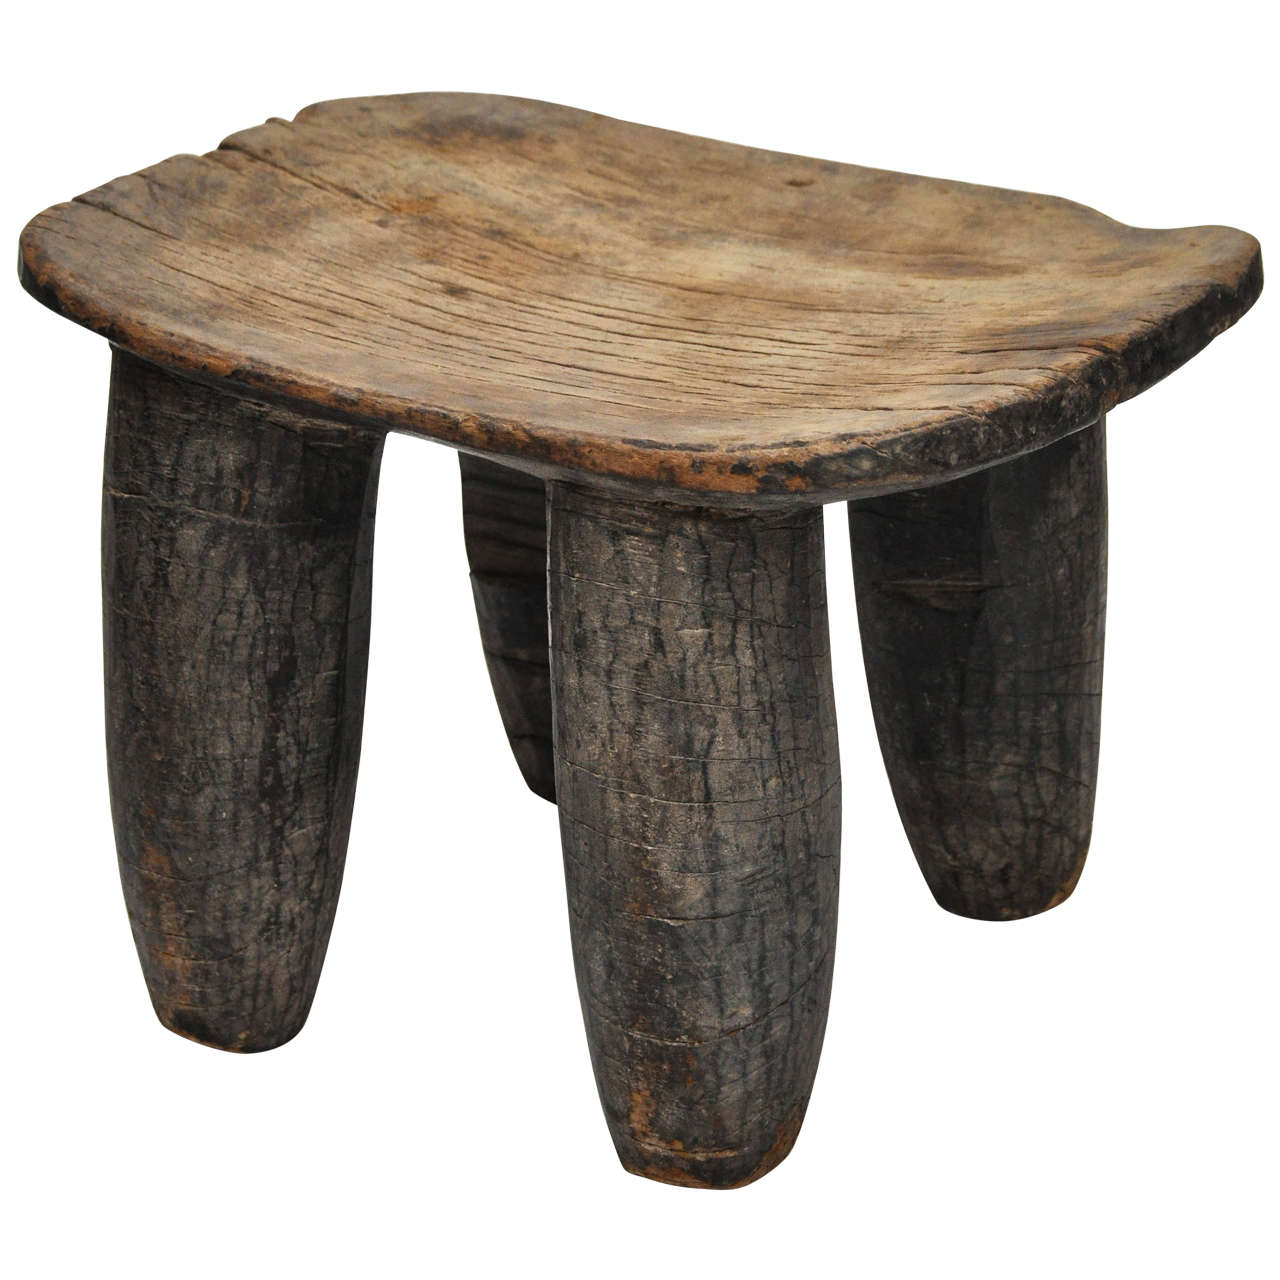 Four-Legged Senufo African Stool 1